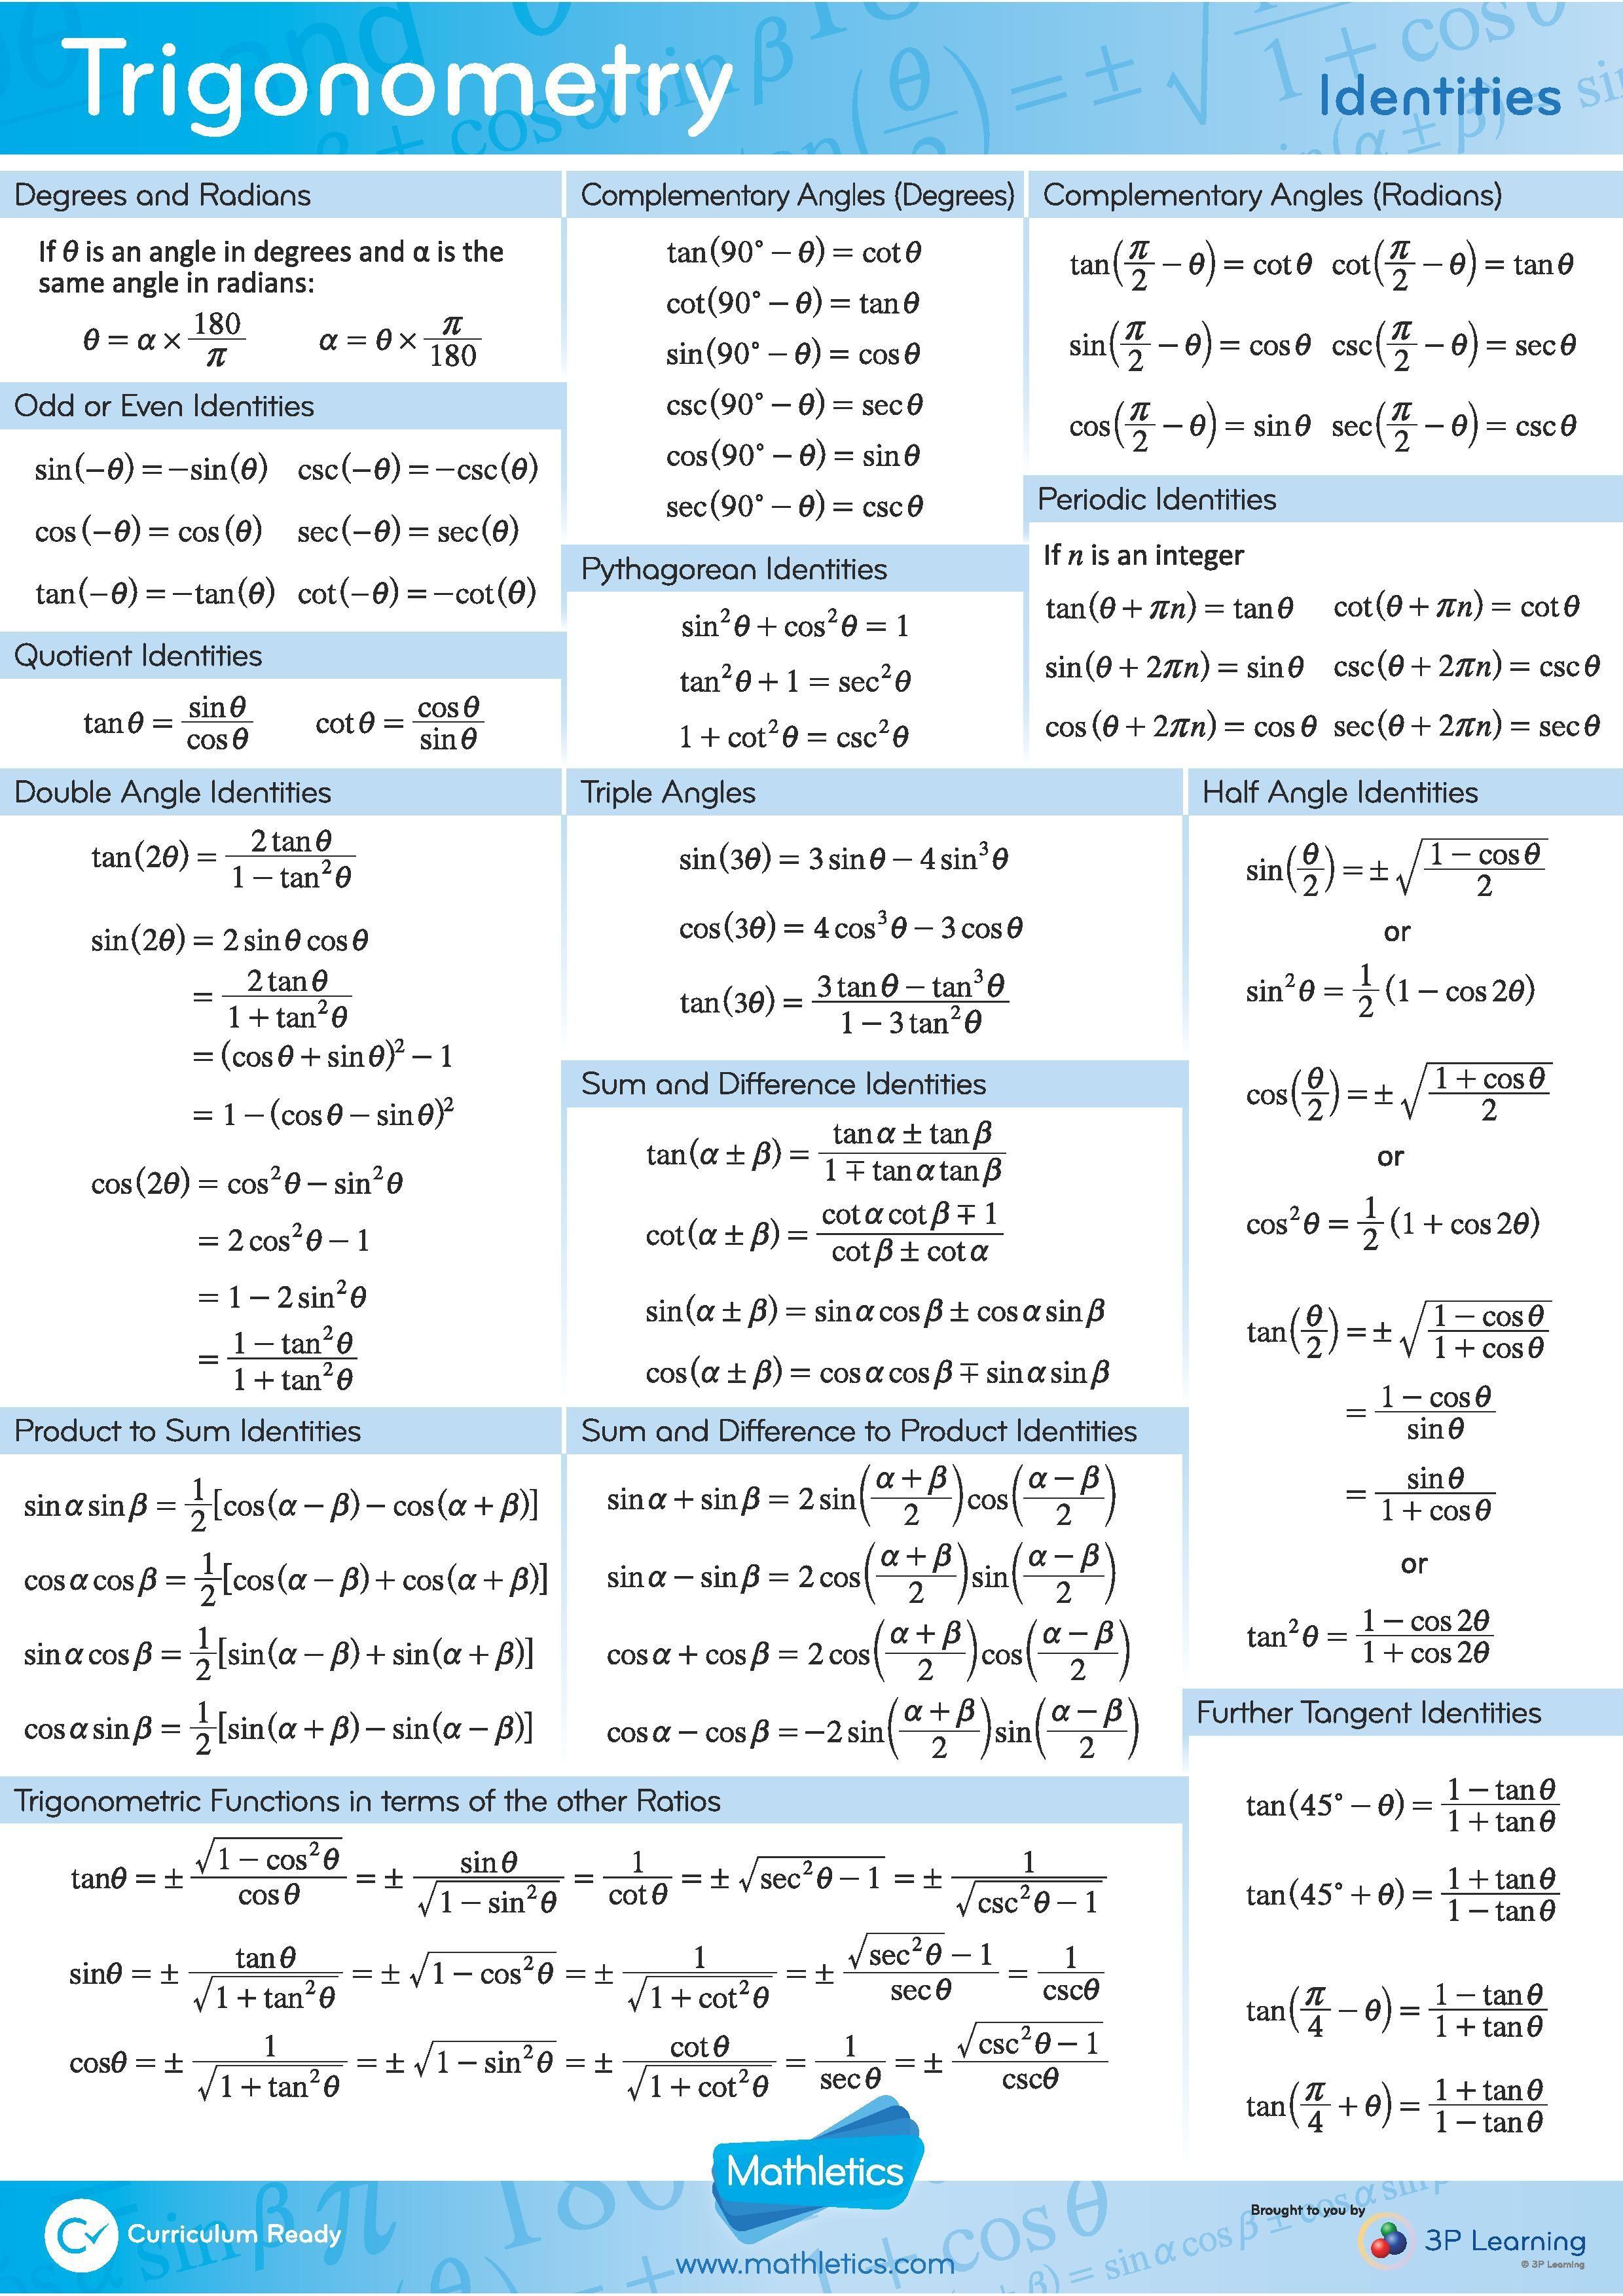 Trigonometry Identities Mathletics Formulae And Laws Factsheet Free Download Available In Pdf Pelajaran Matematika Kalkulus Trigonometri